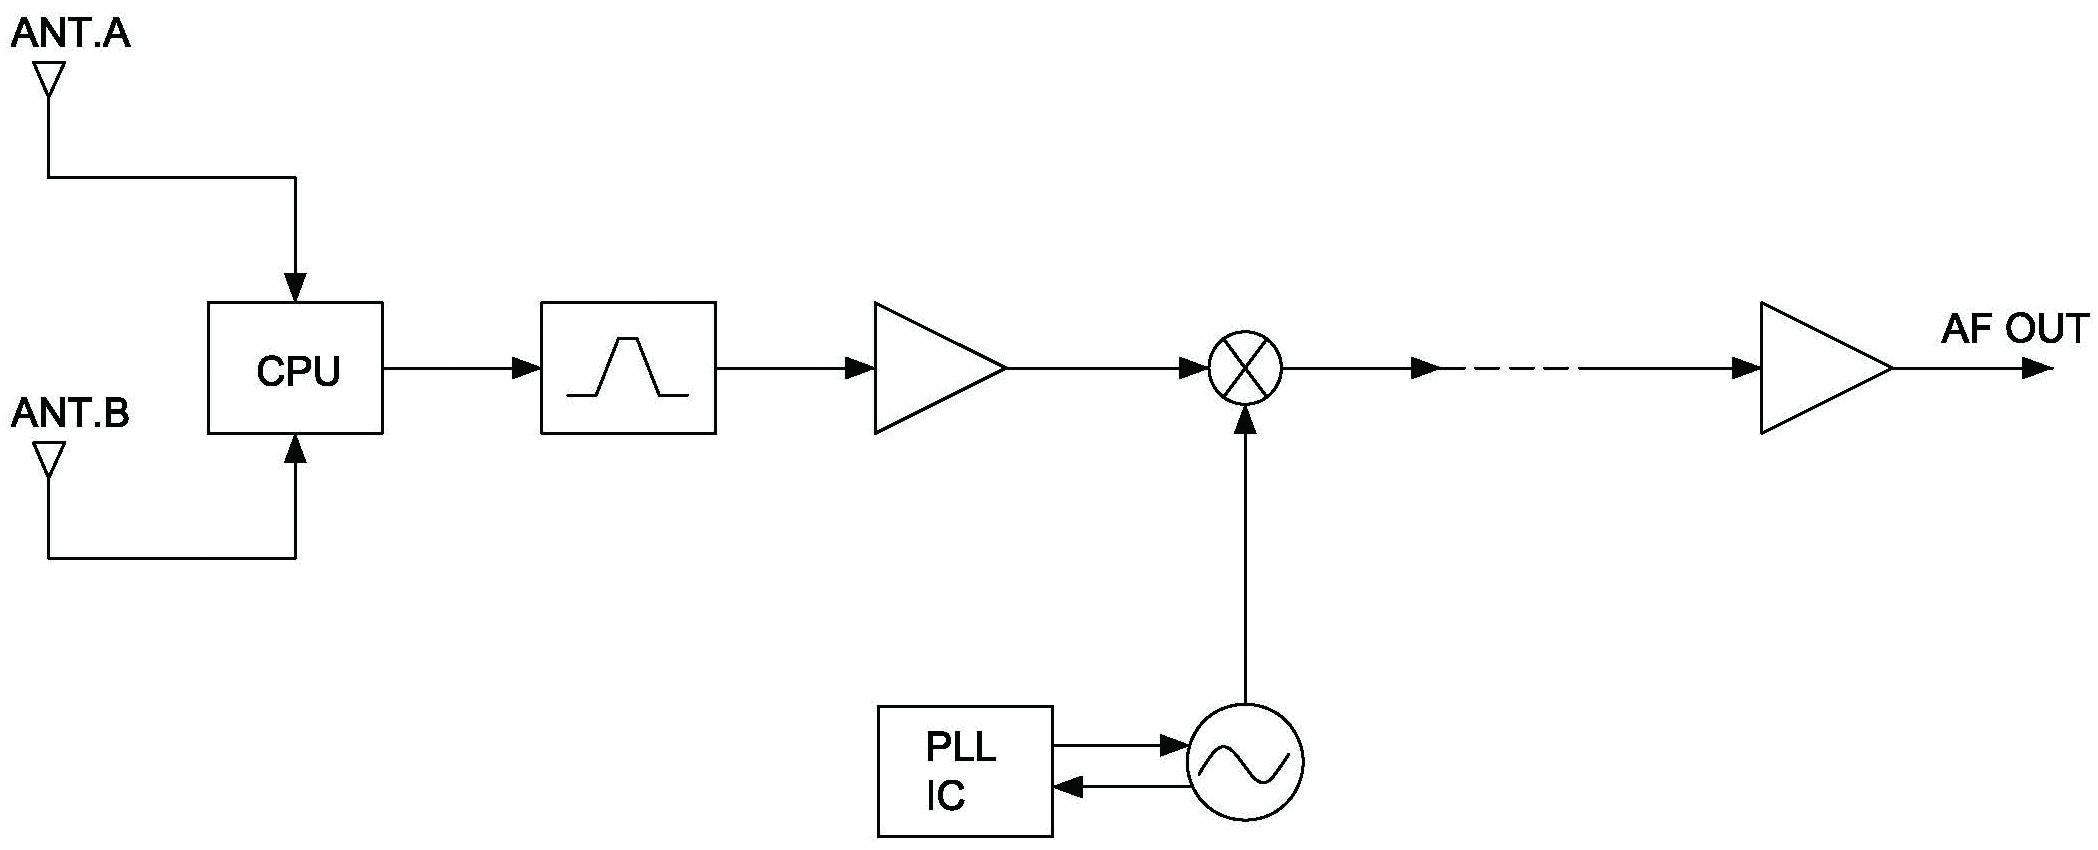 Figure 2: Dual antenna diversity or called Predictive-Diversity Receiving